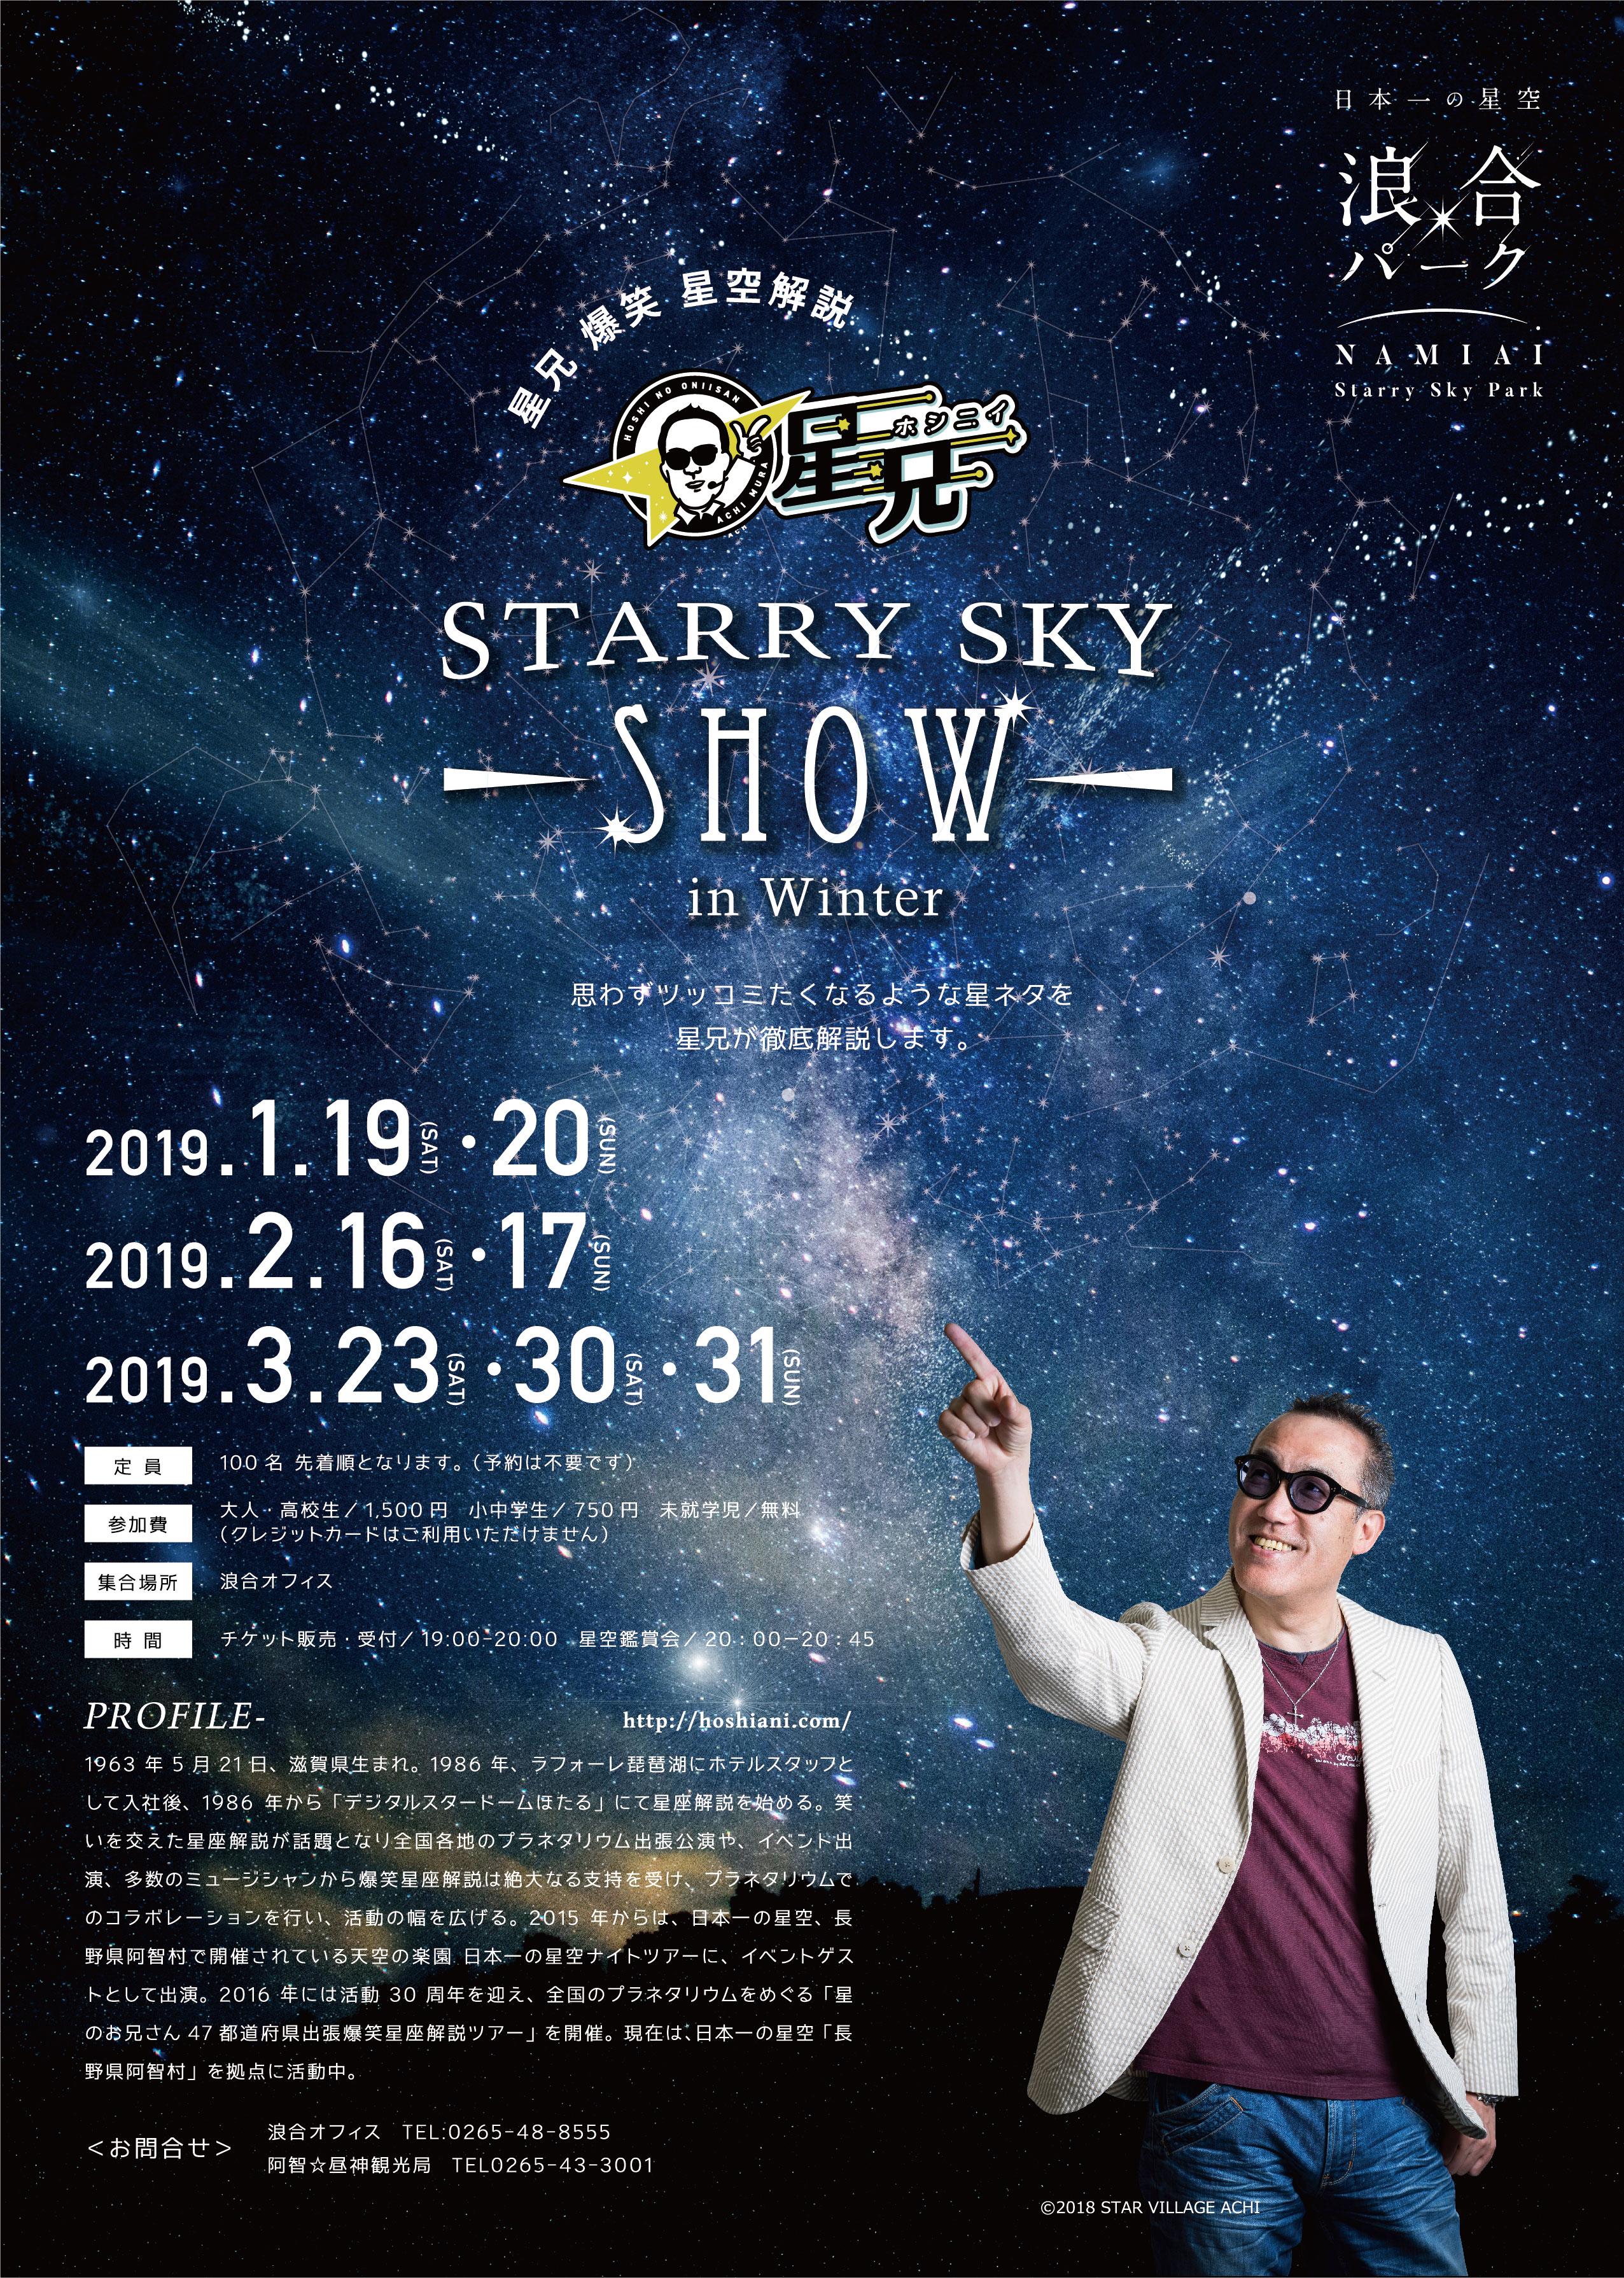 STARRY SKY SHOW in Winter